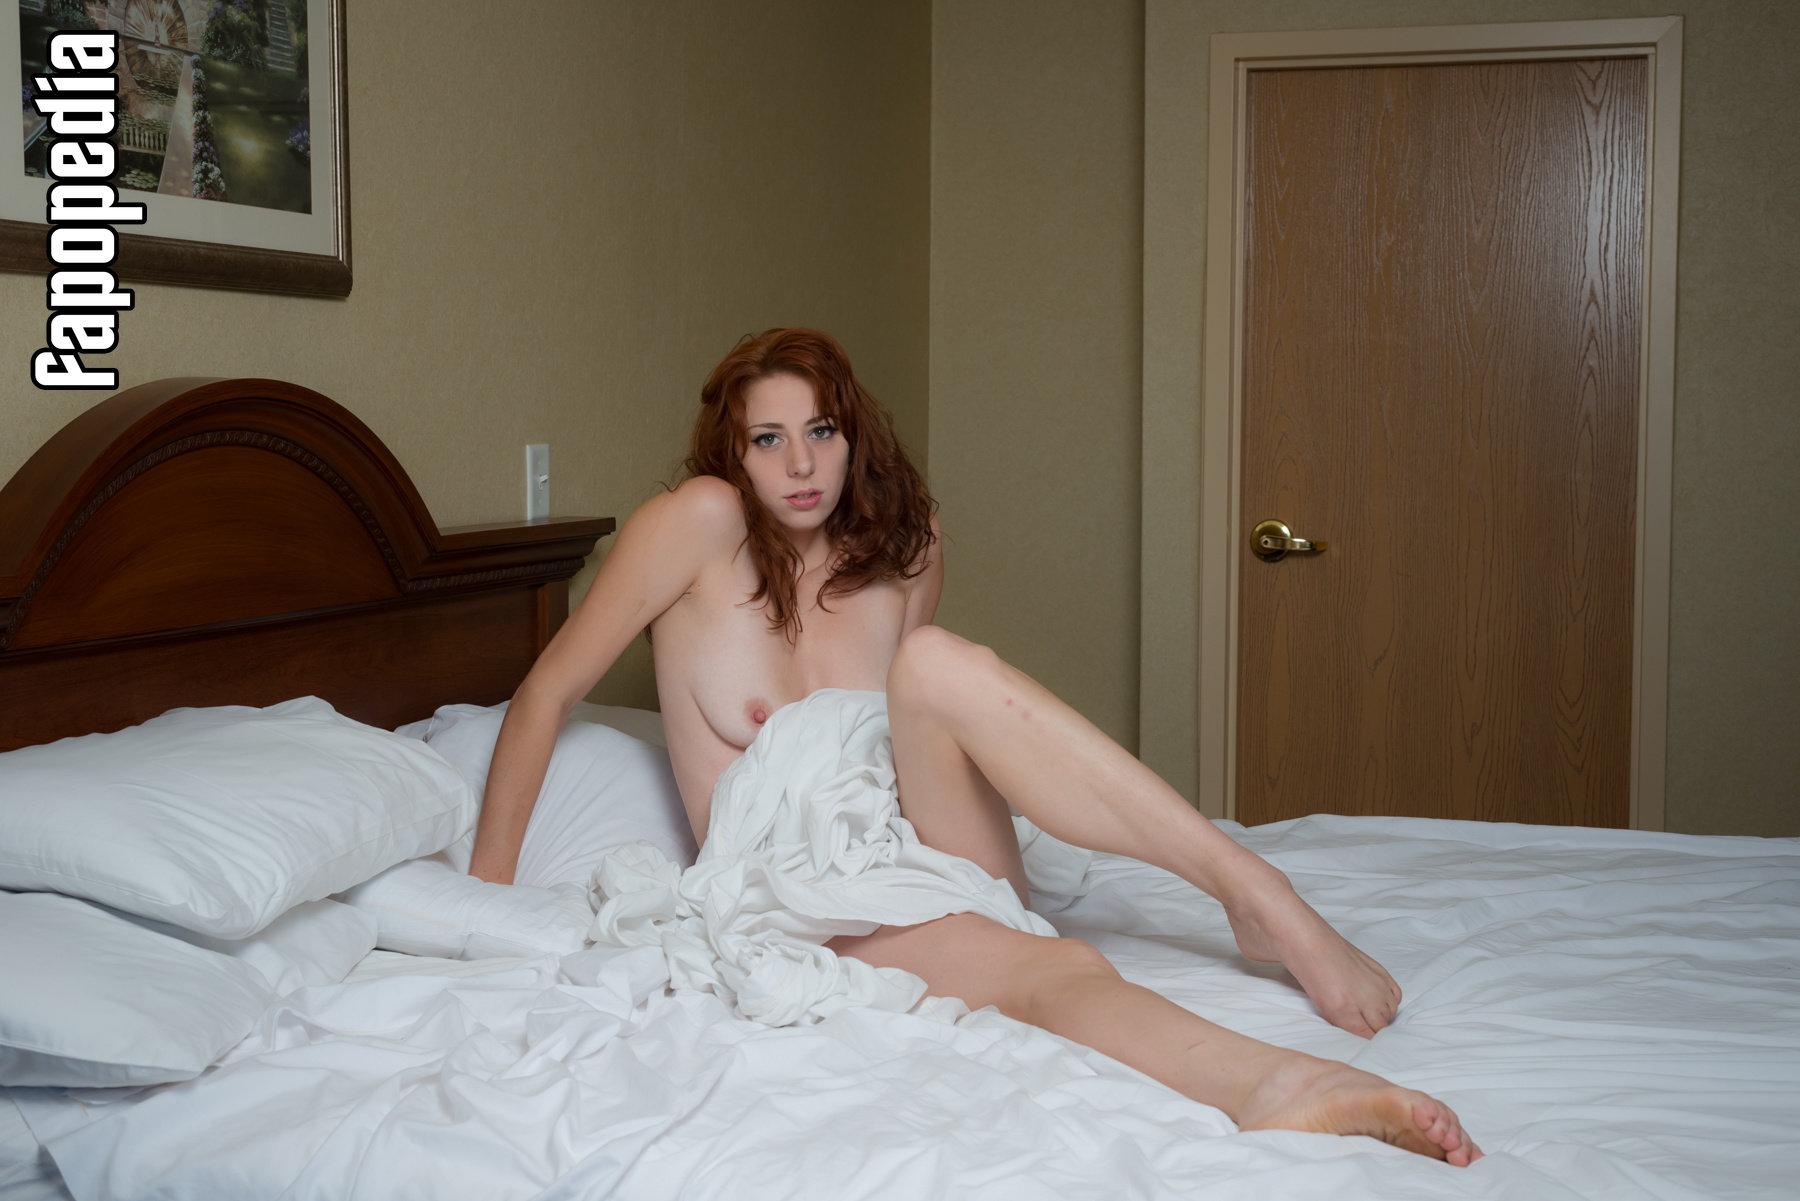 Belladonnaphoto Nude Patreon Leaks